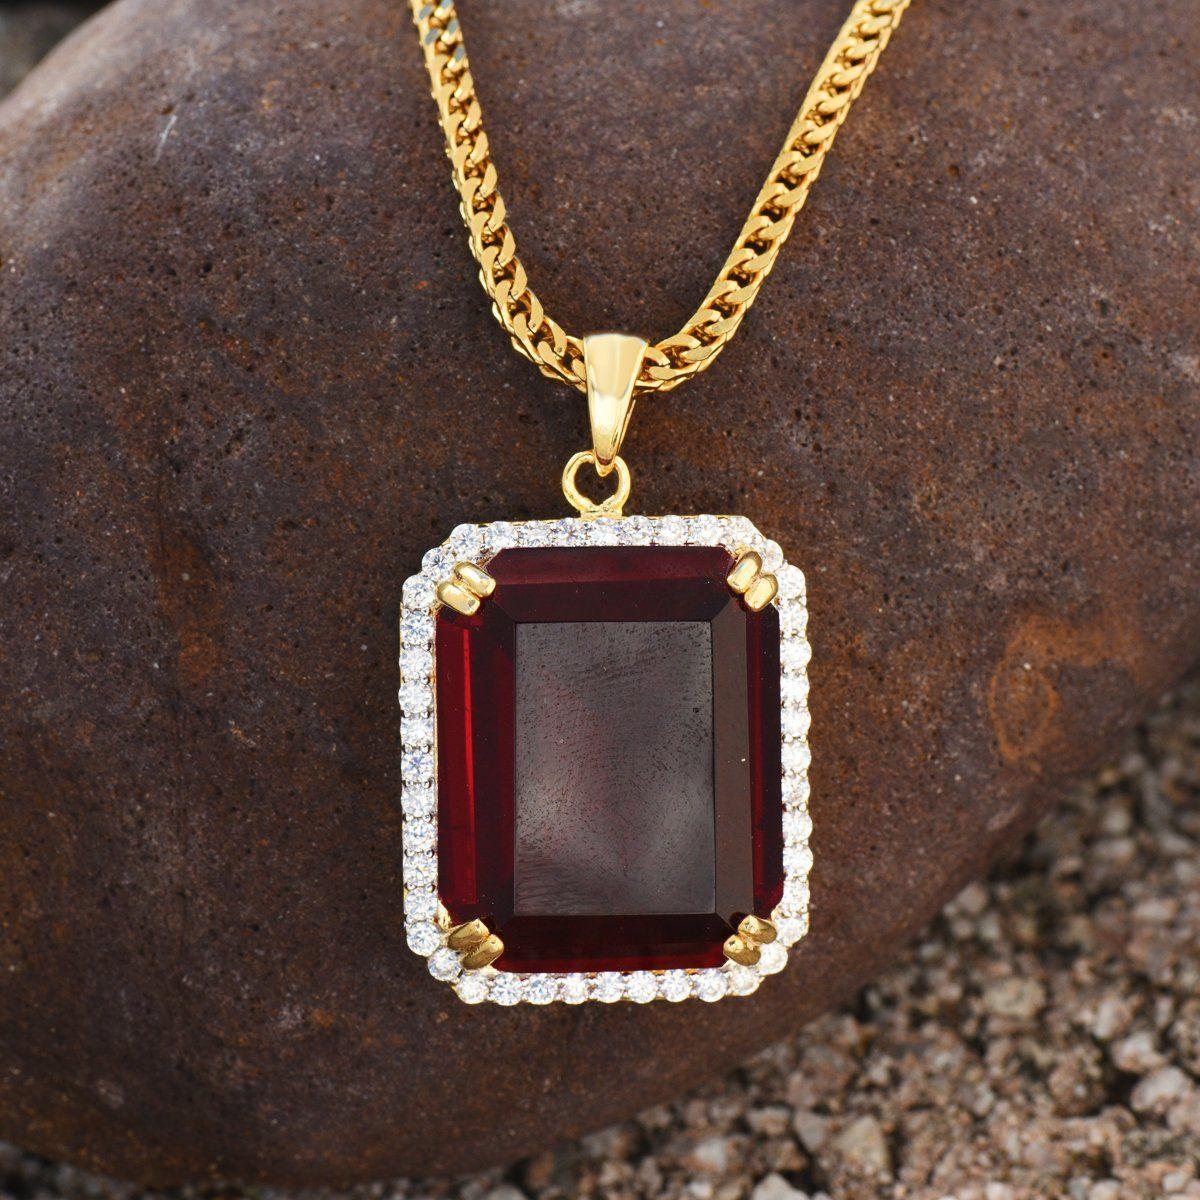 Garnet ruby pendant necklace set k yellow gold charm mens rapper